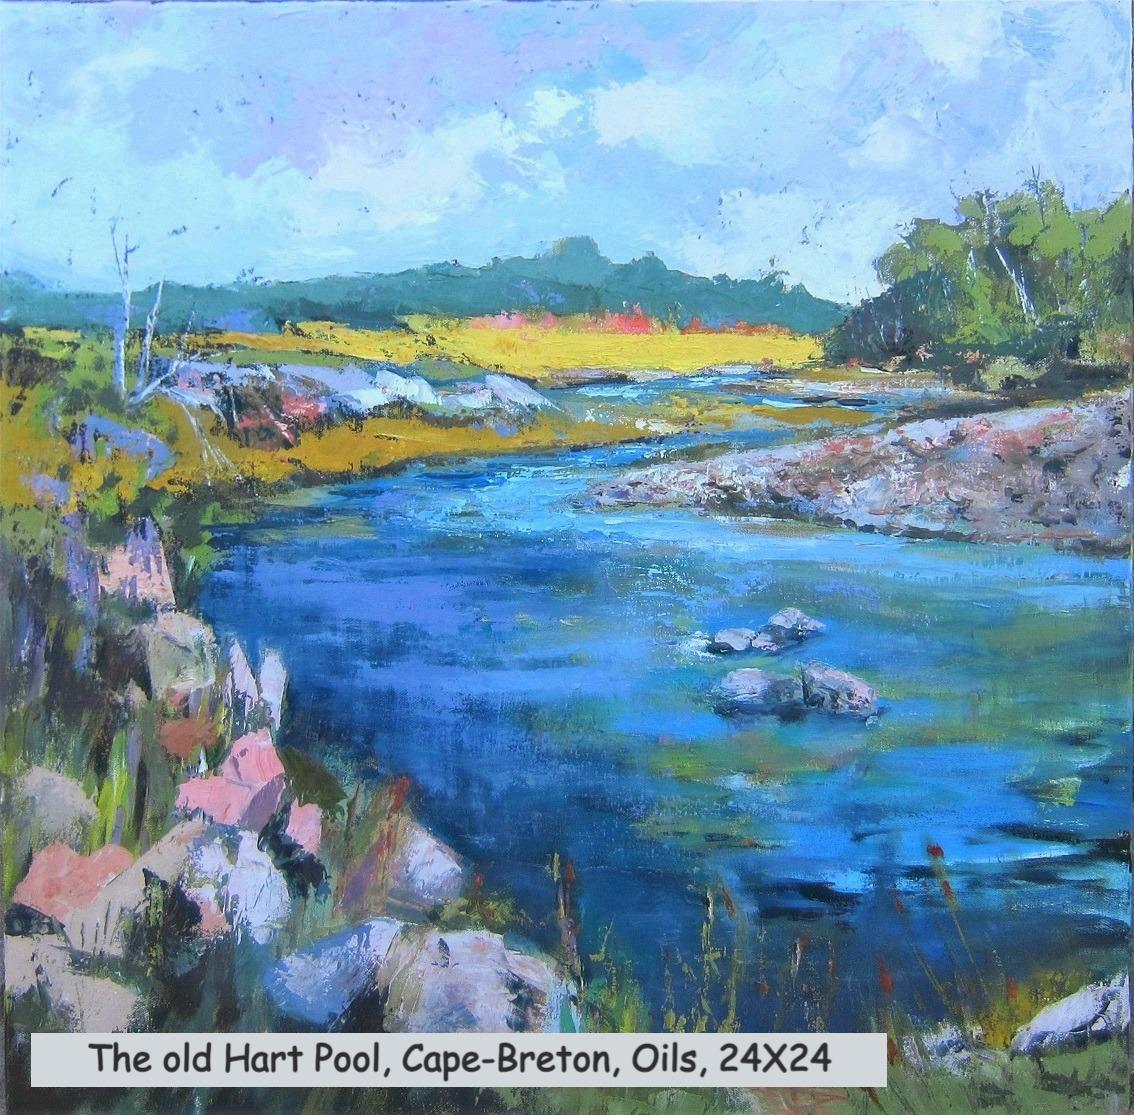 The old Hart Pool, Cape-Breton, oils, 24